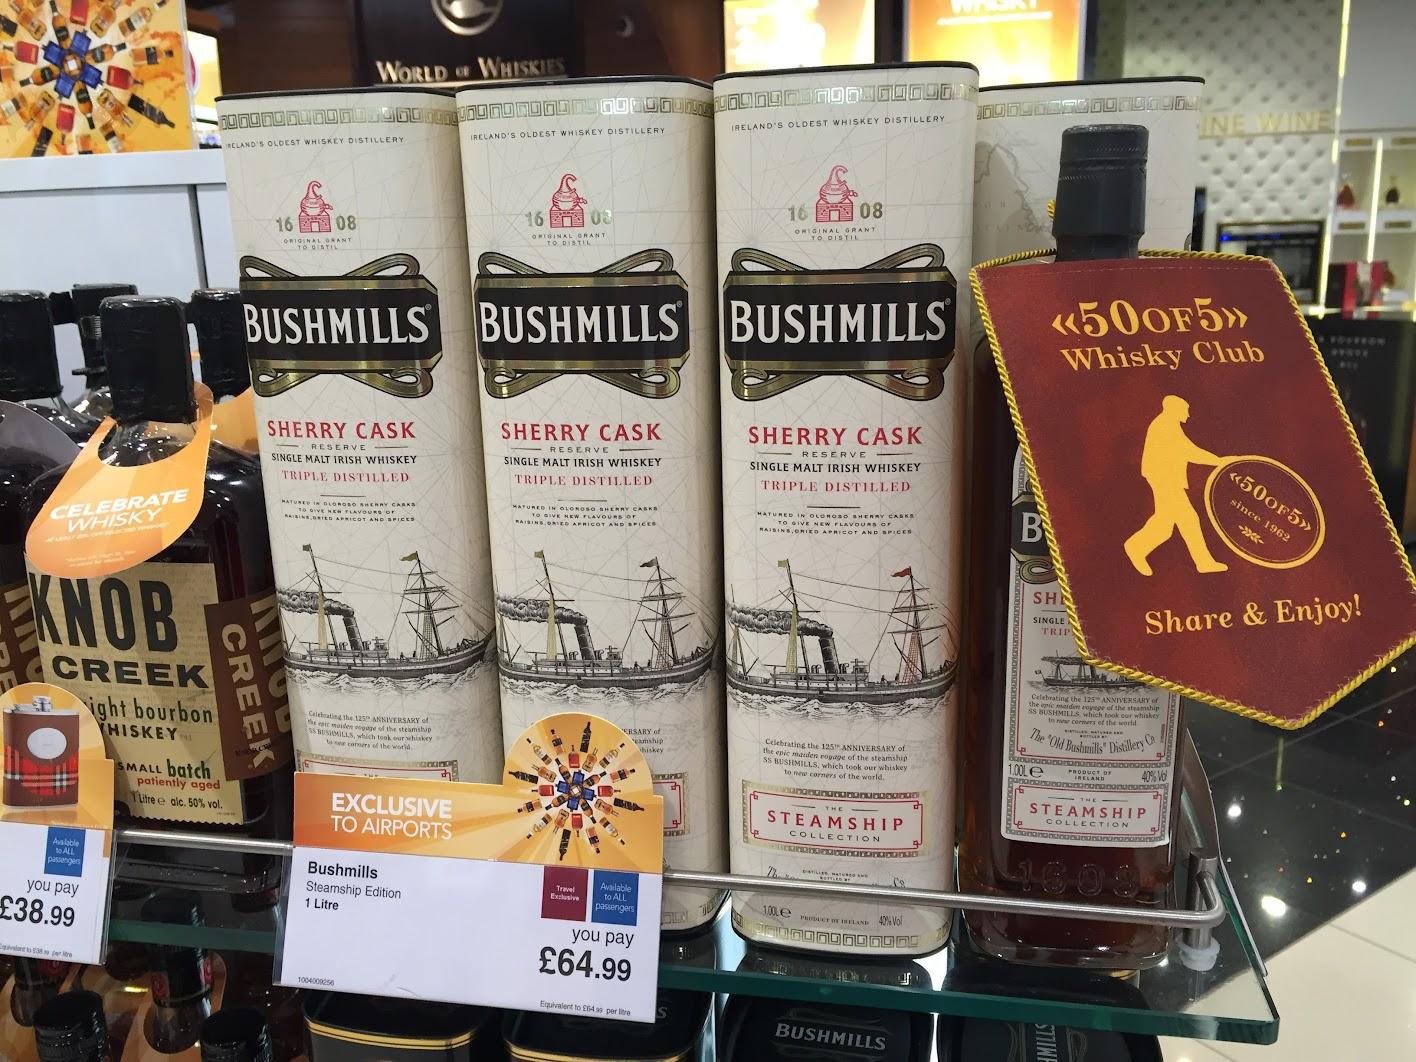 Bushmills Sherry